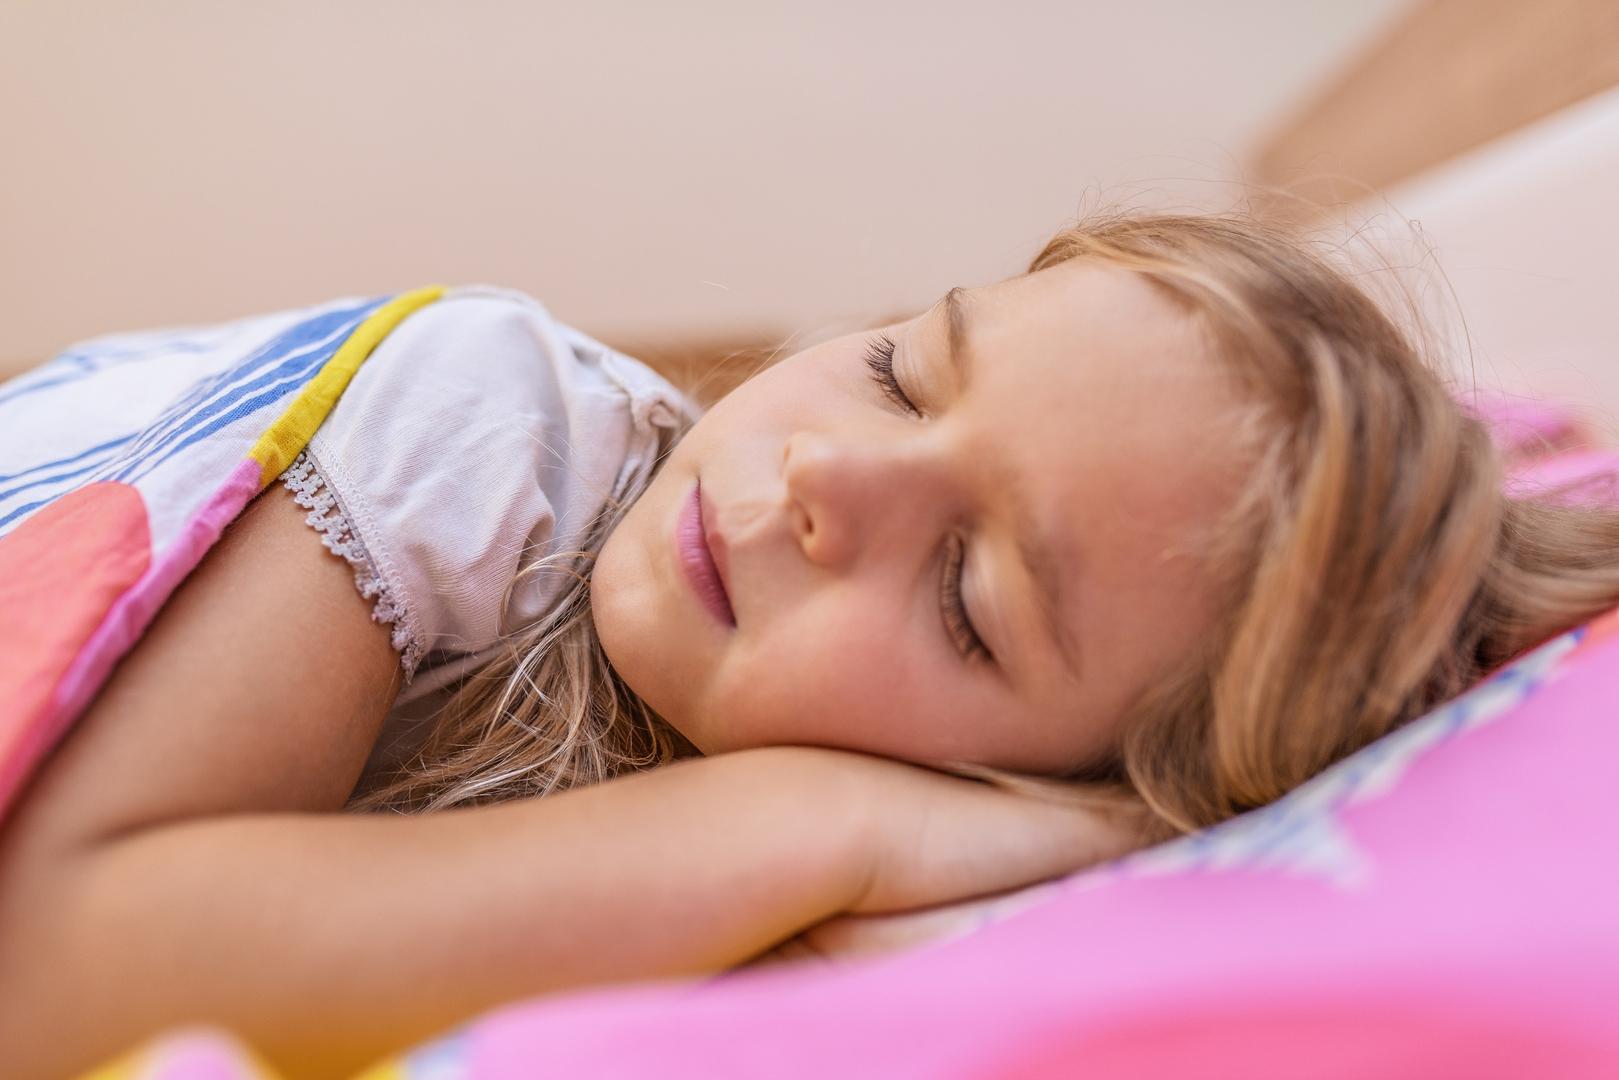 person-overall-teen-sleep-disorders-birthday-sex-teaser